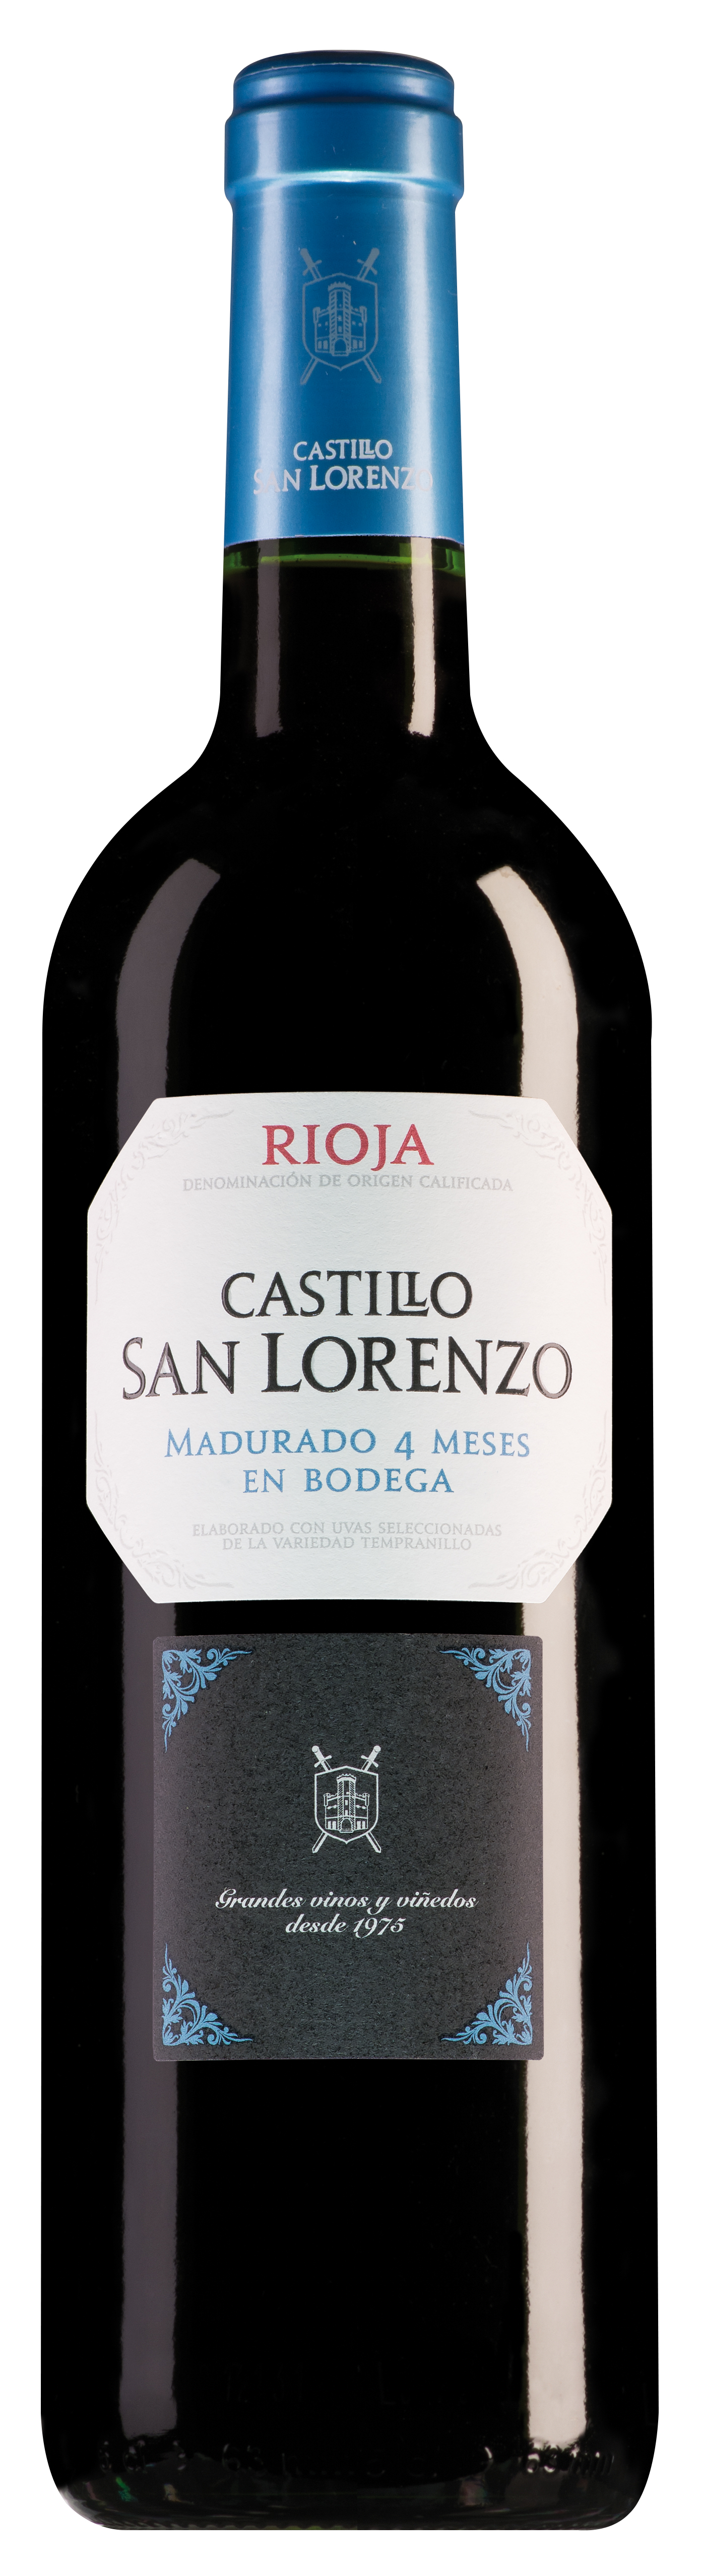 Castillo de San Lorenzo Rioja Roble